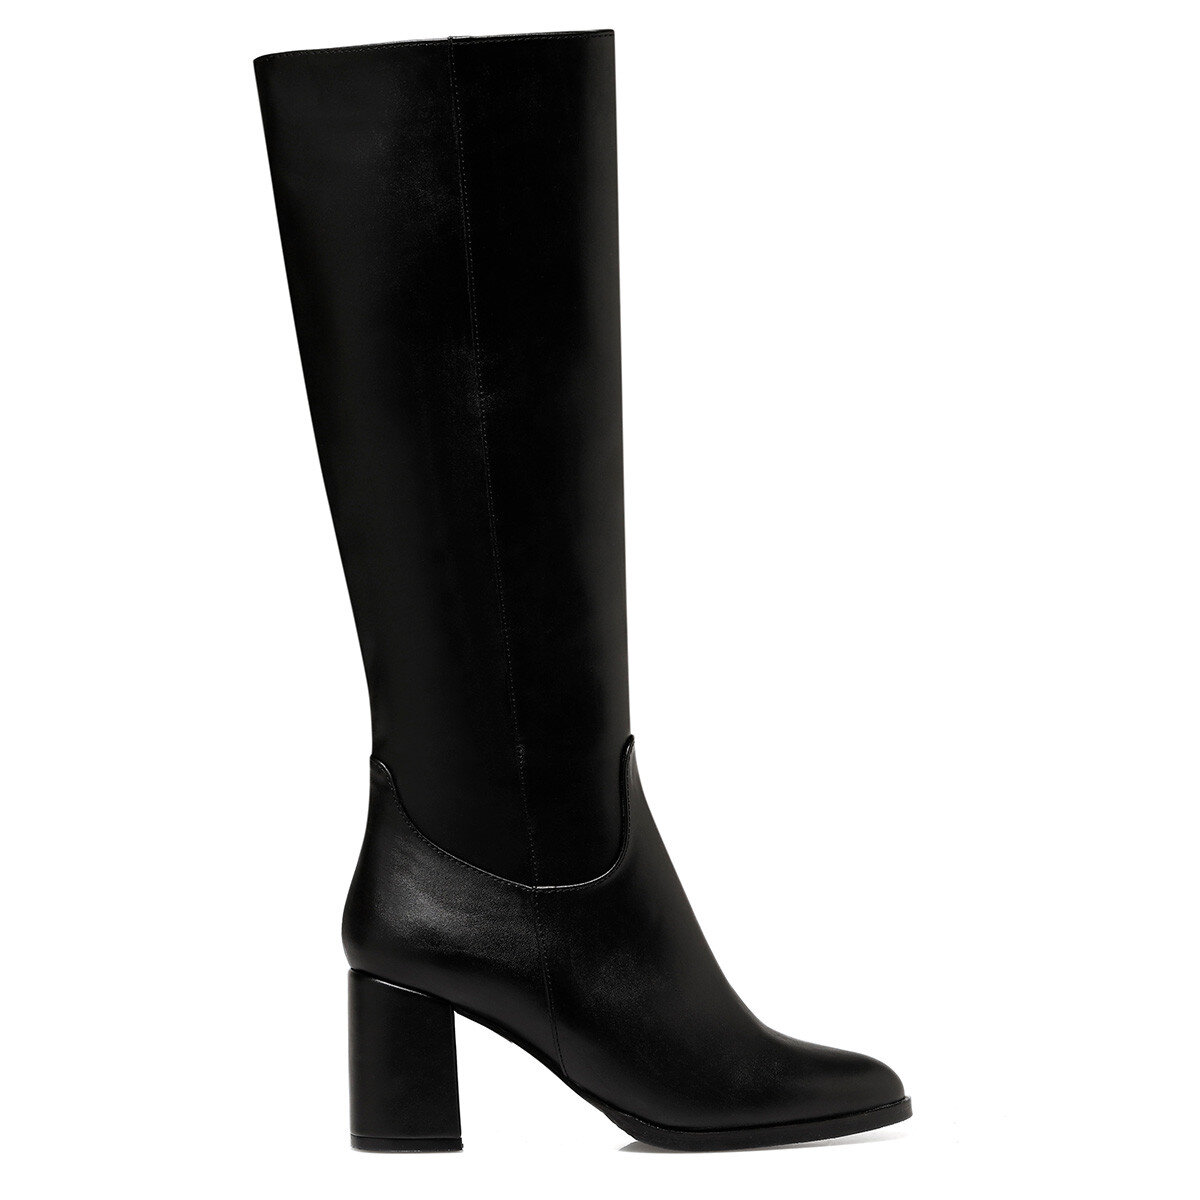 MASSA3 Siyah Kadın Topuklu Çizme